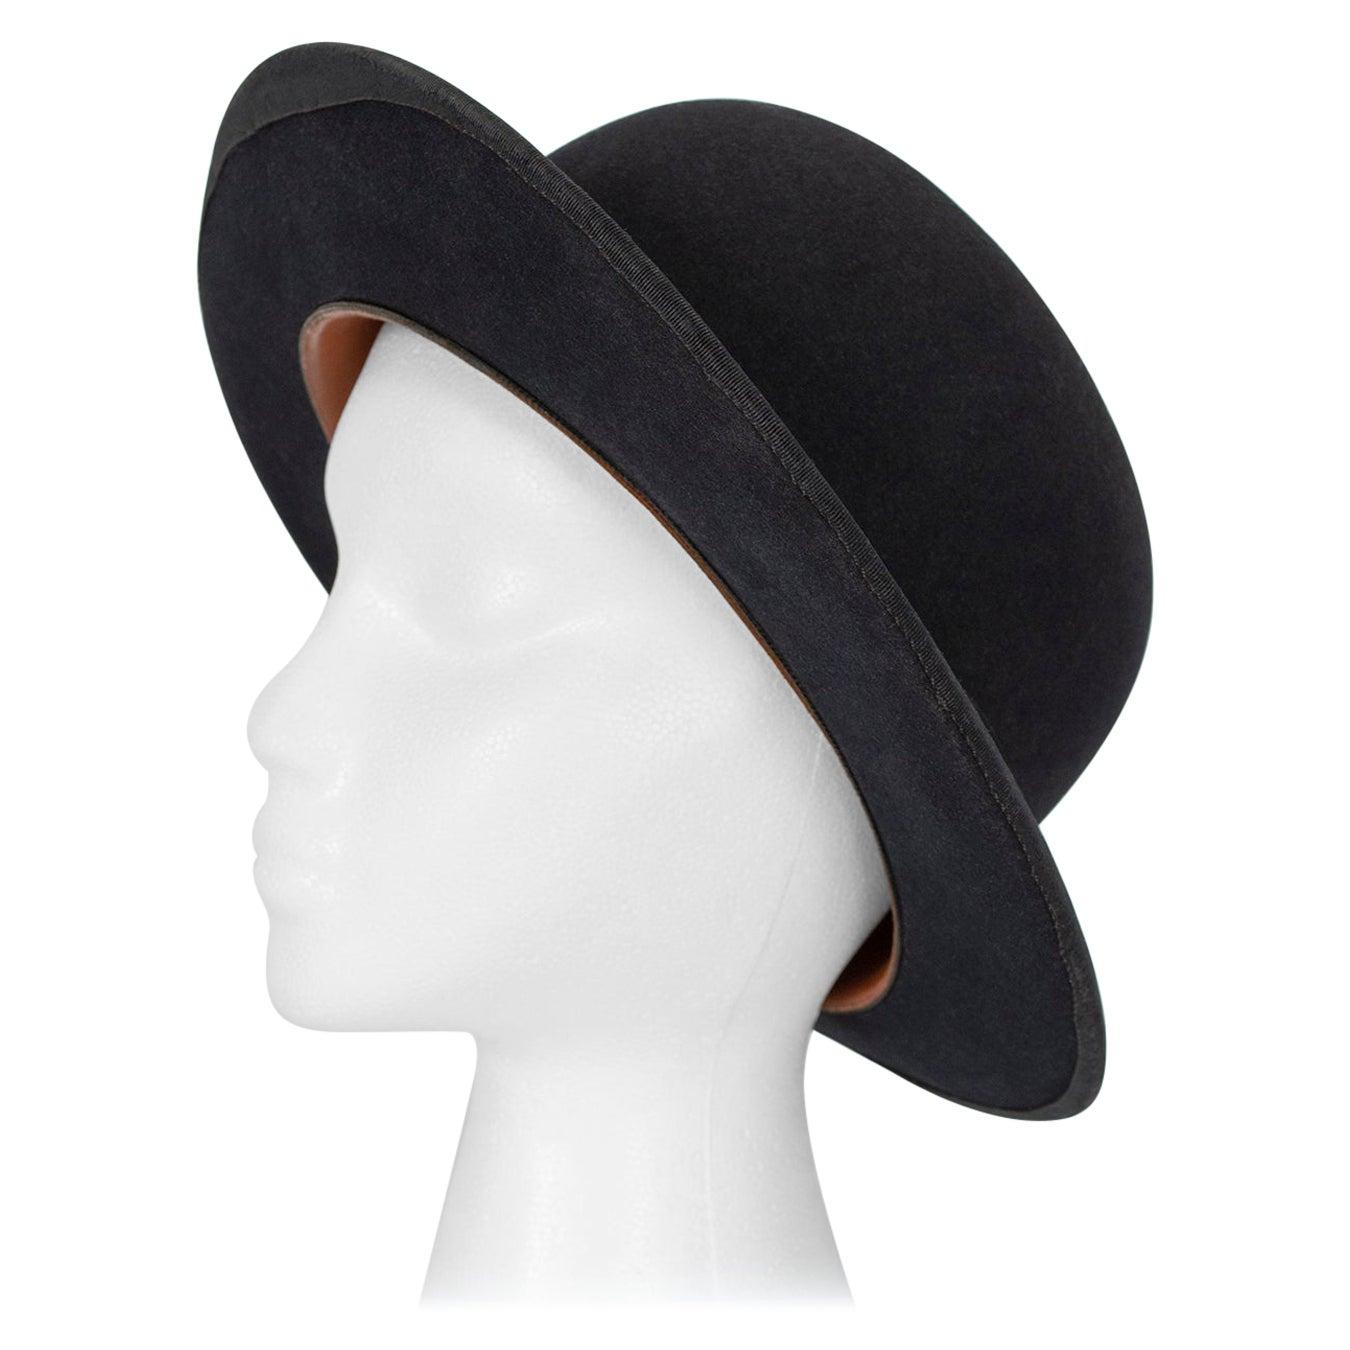 Men's William Lyons Black Fine Felt Bowler Hat – size 7 1/8, 1920s